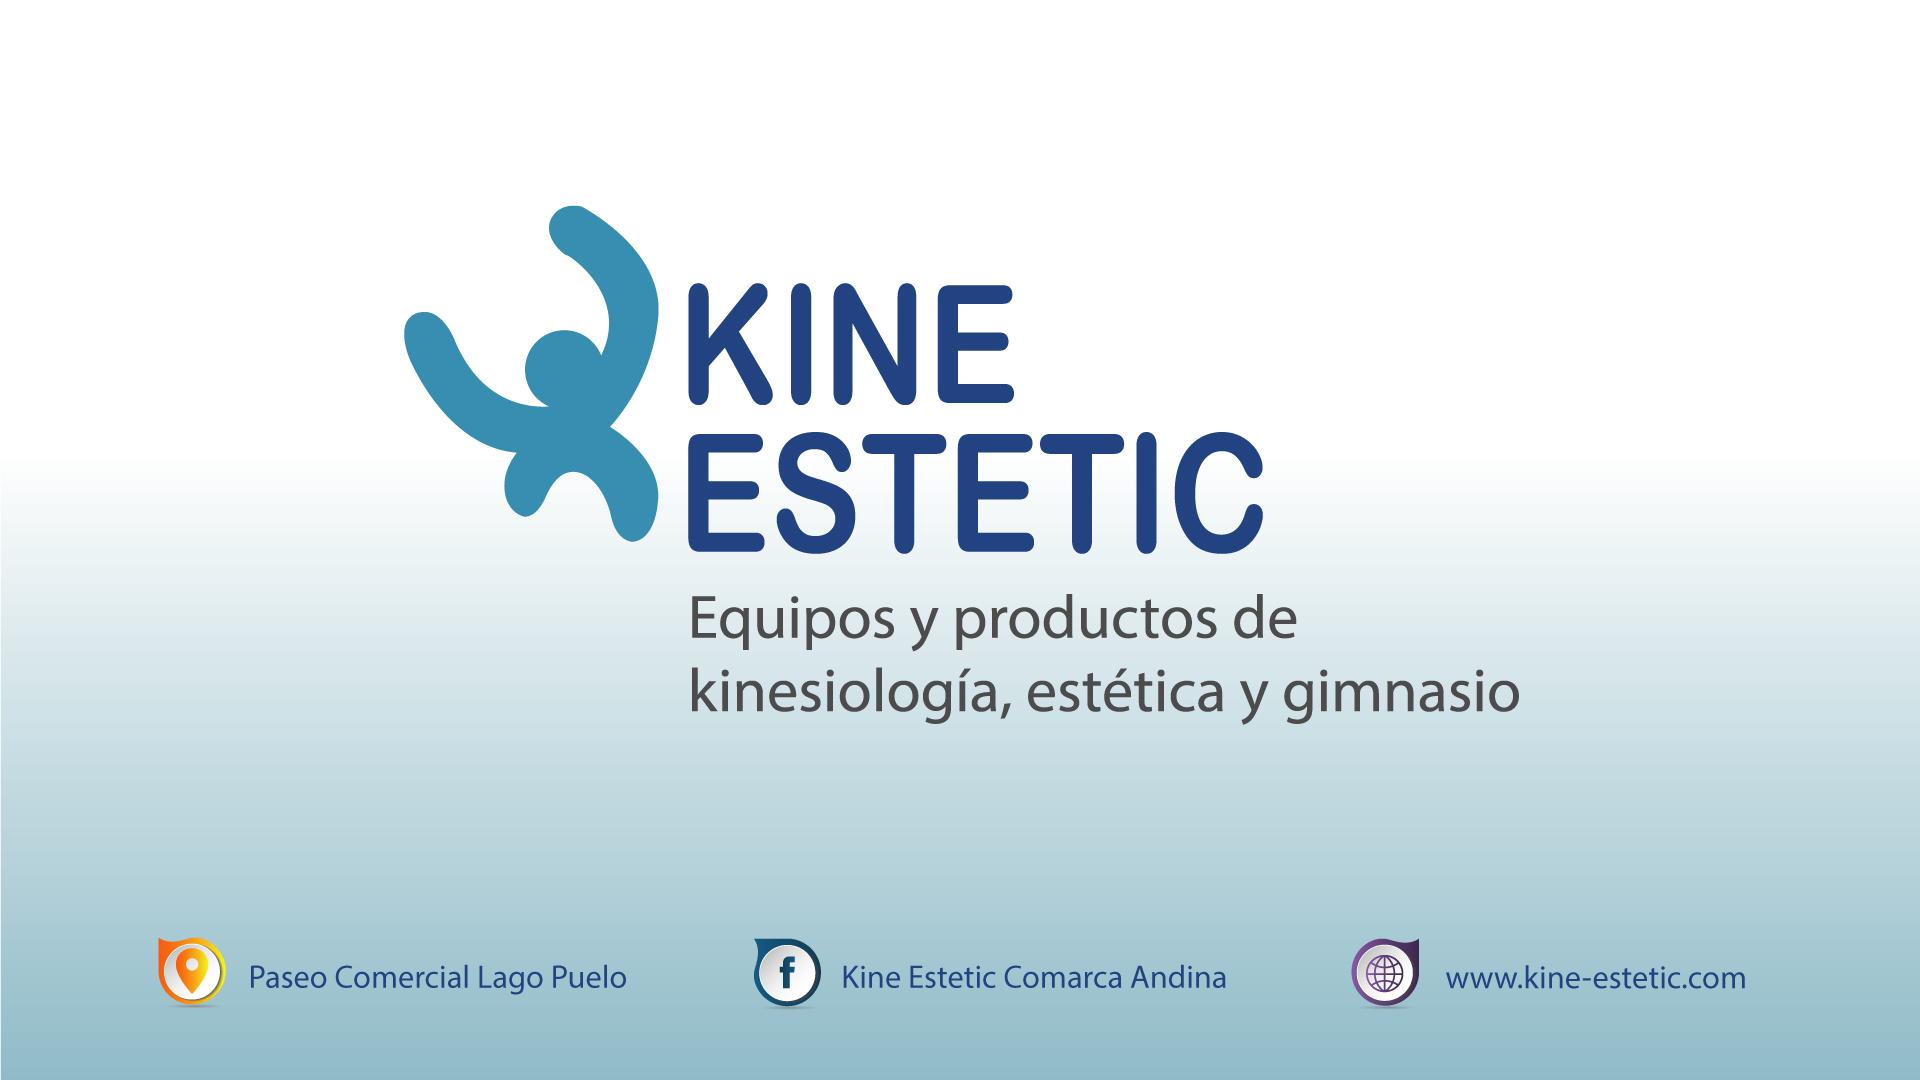 Kine Stetic